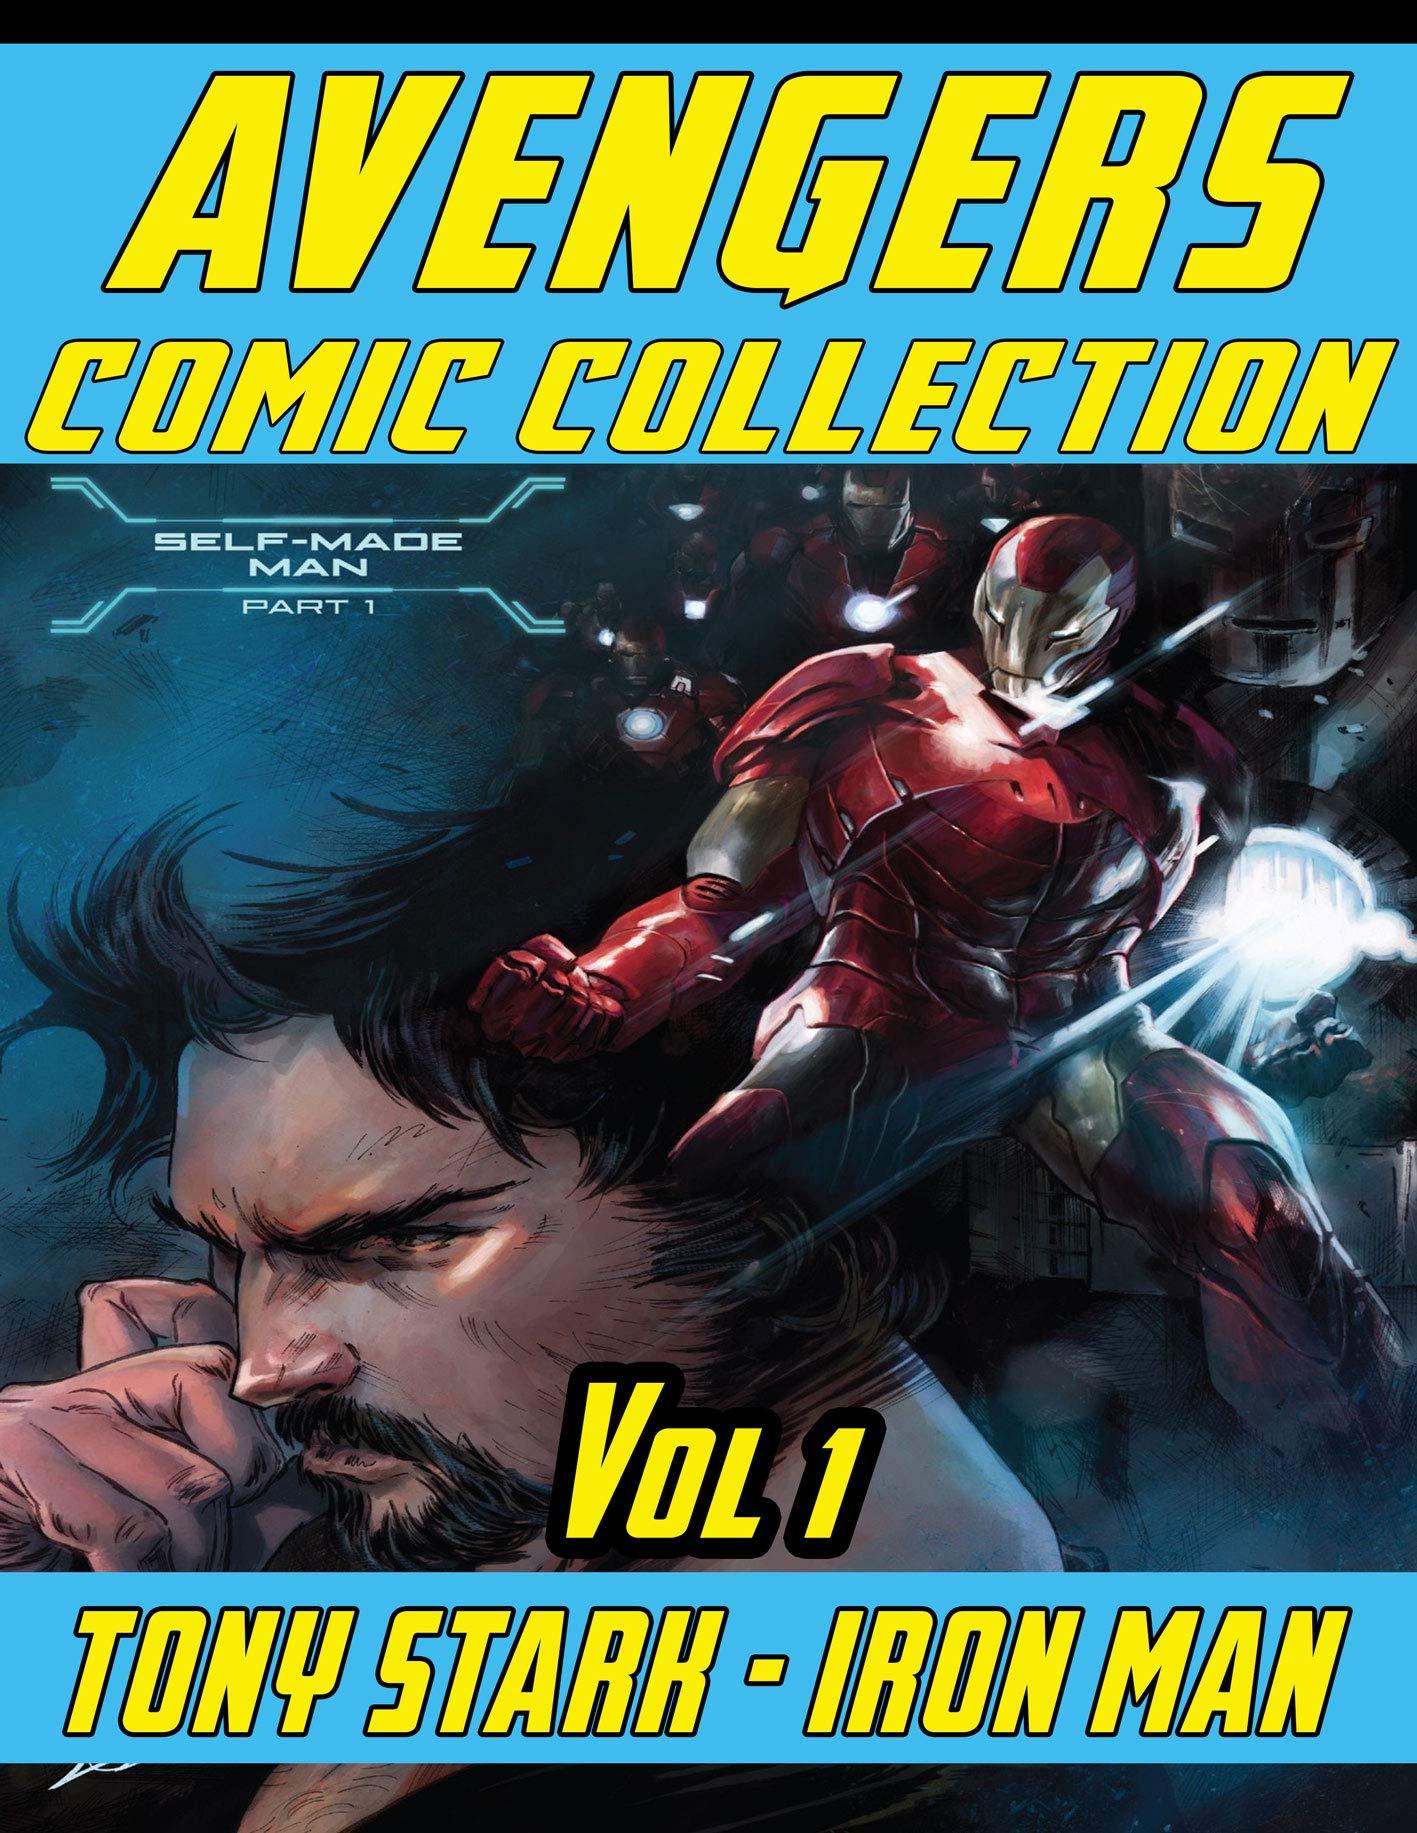 Tony Stark Iron Vol 1: Superheroes Avenger Team Comics Books For Kids, Boys , Girls , Fans , Adults